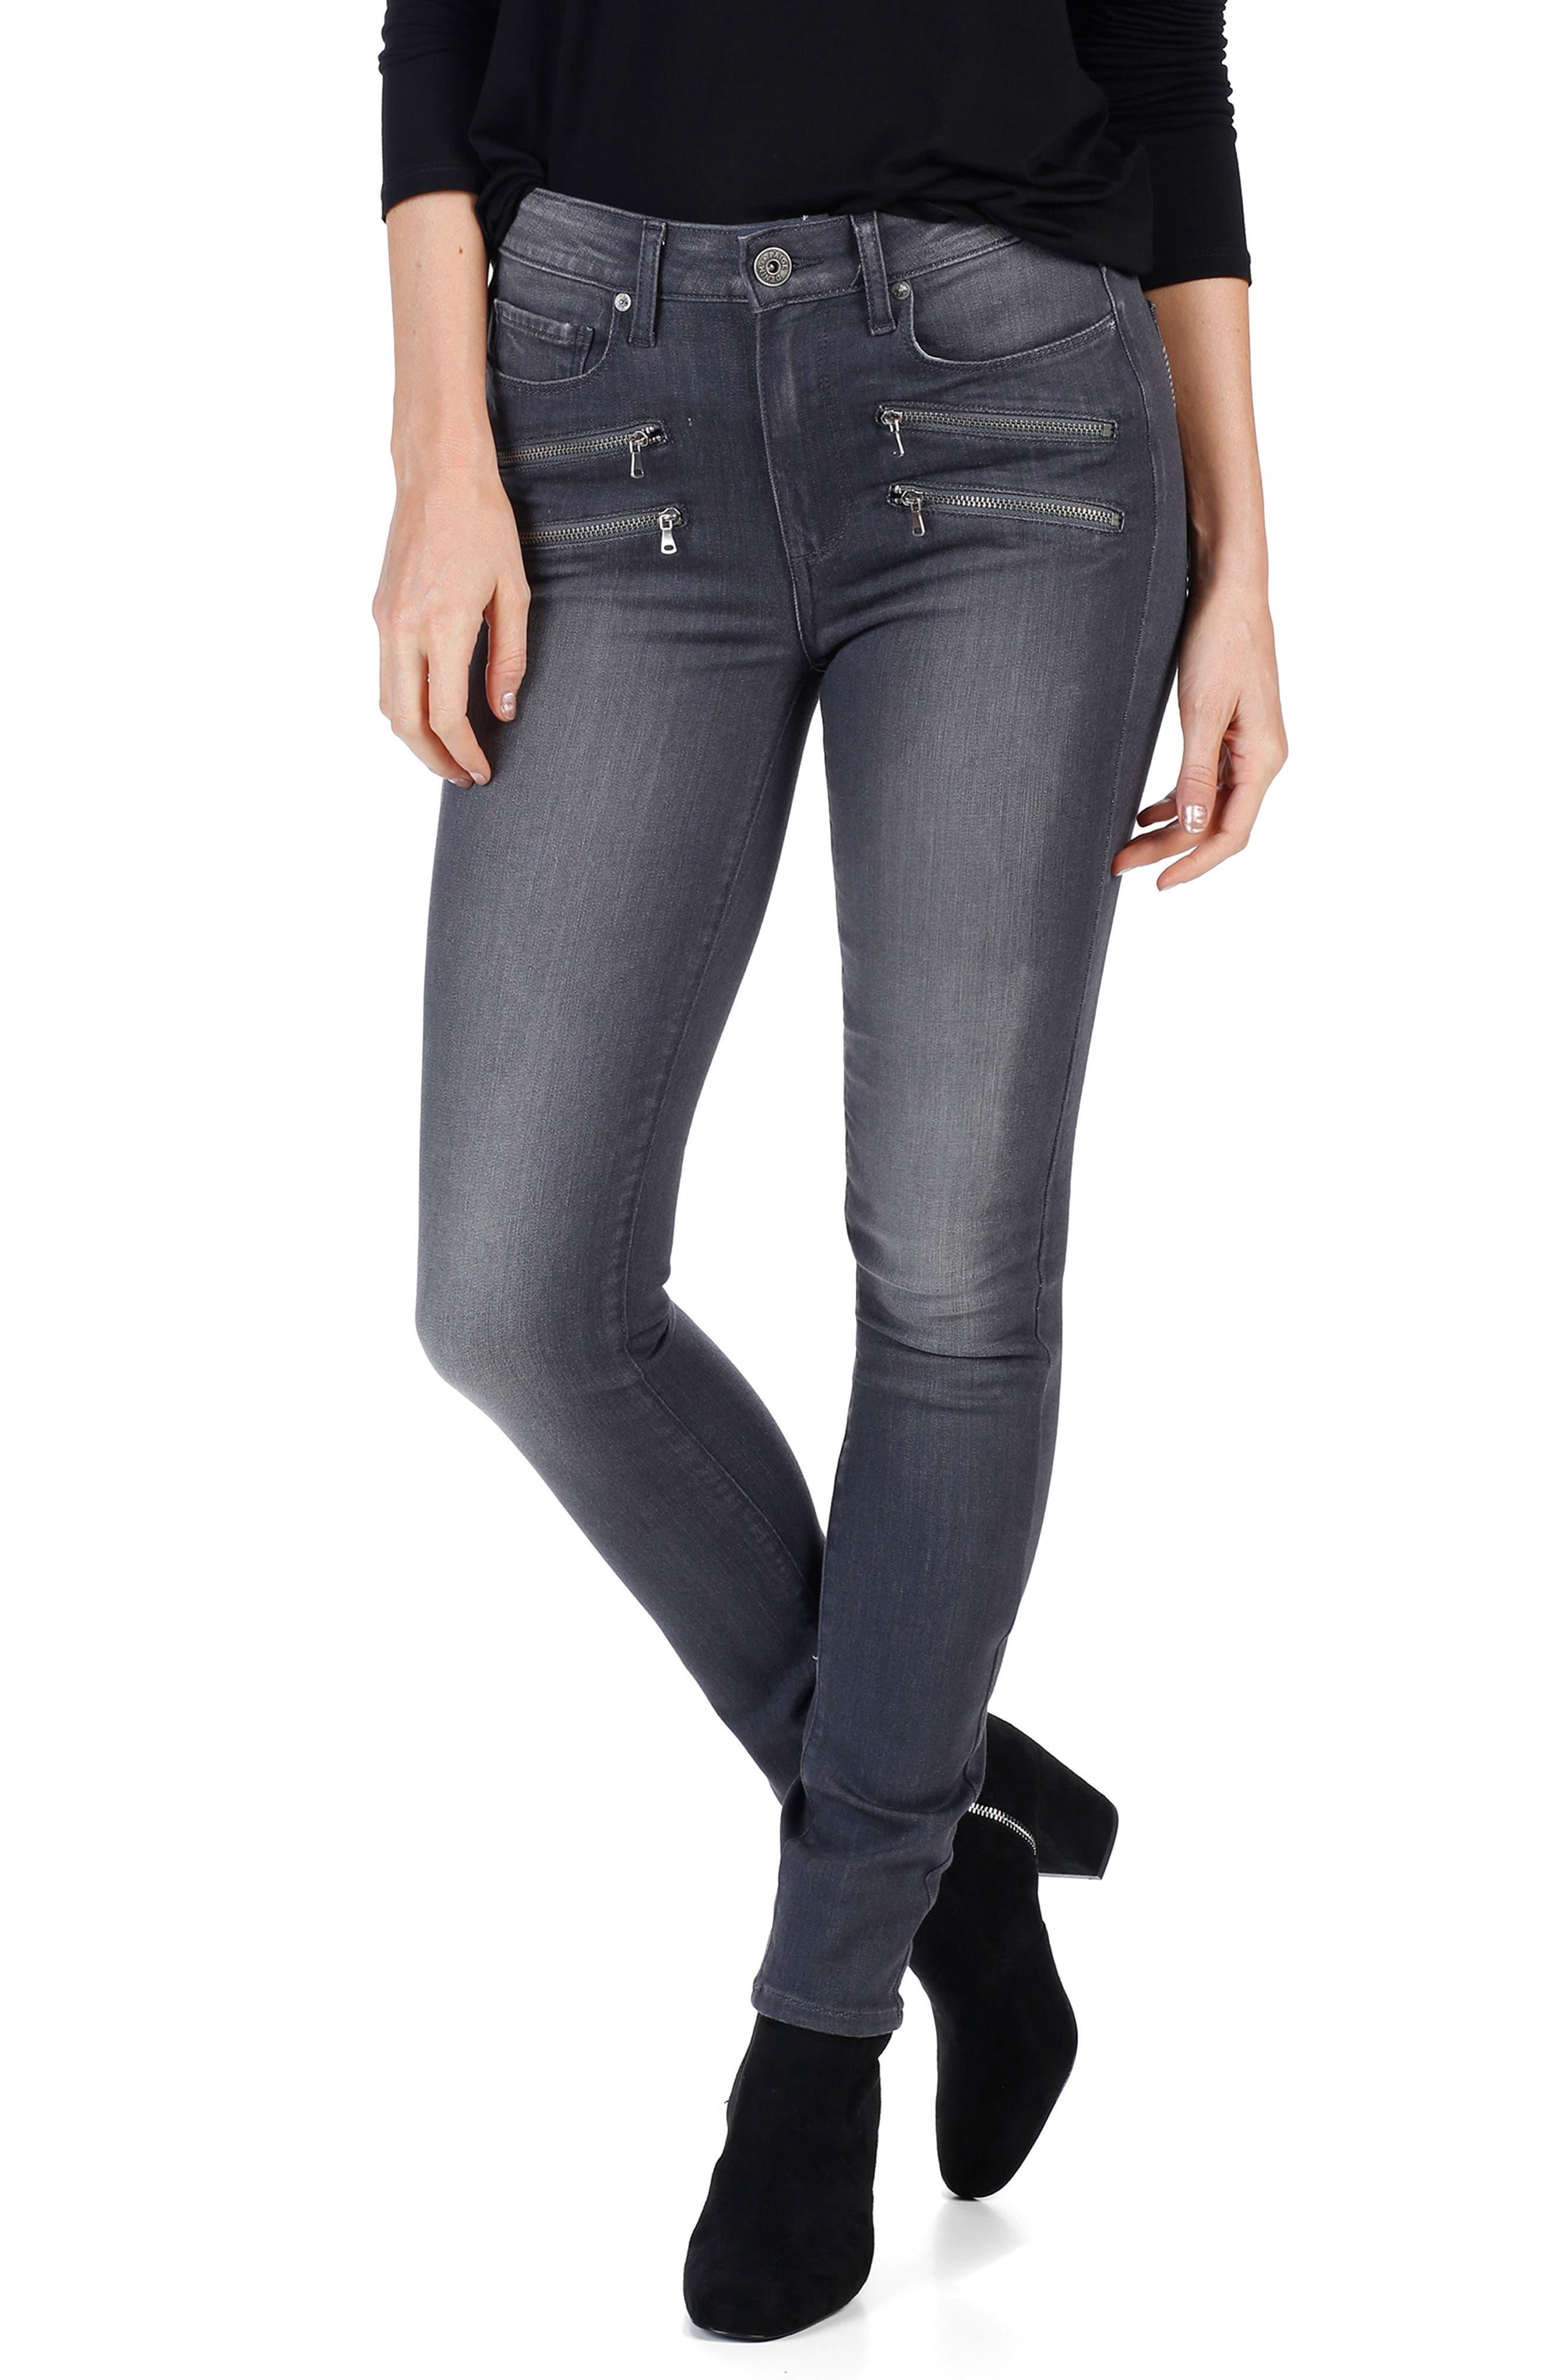 Transcend - Edgemont High Waist Skinny Jeans,                             Main thumbnail 1, color,                             020